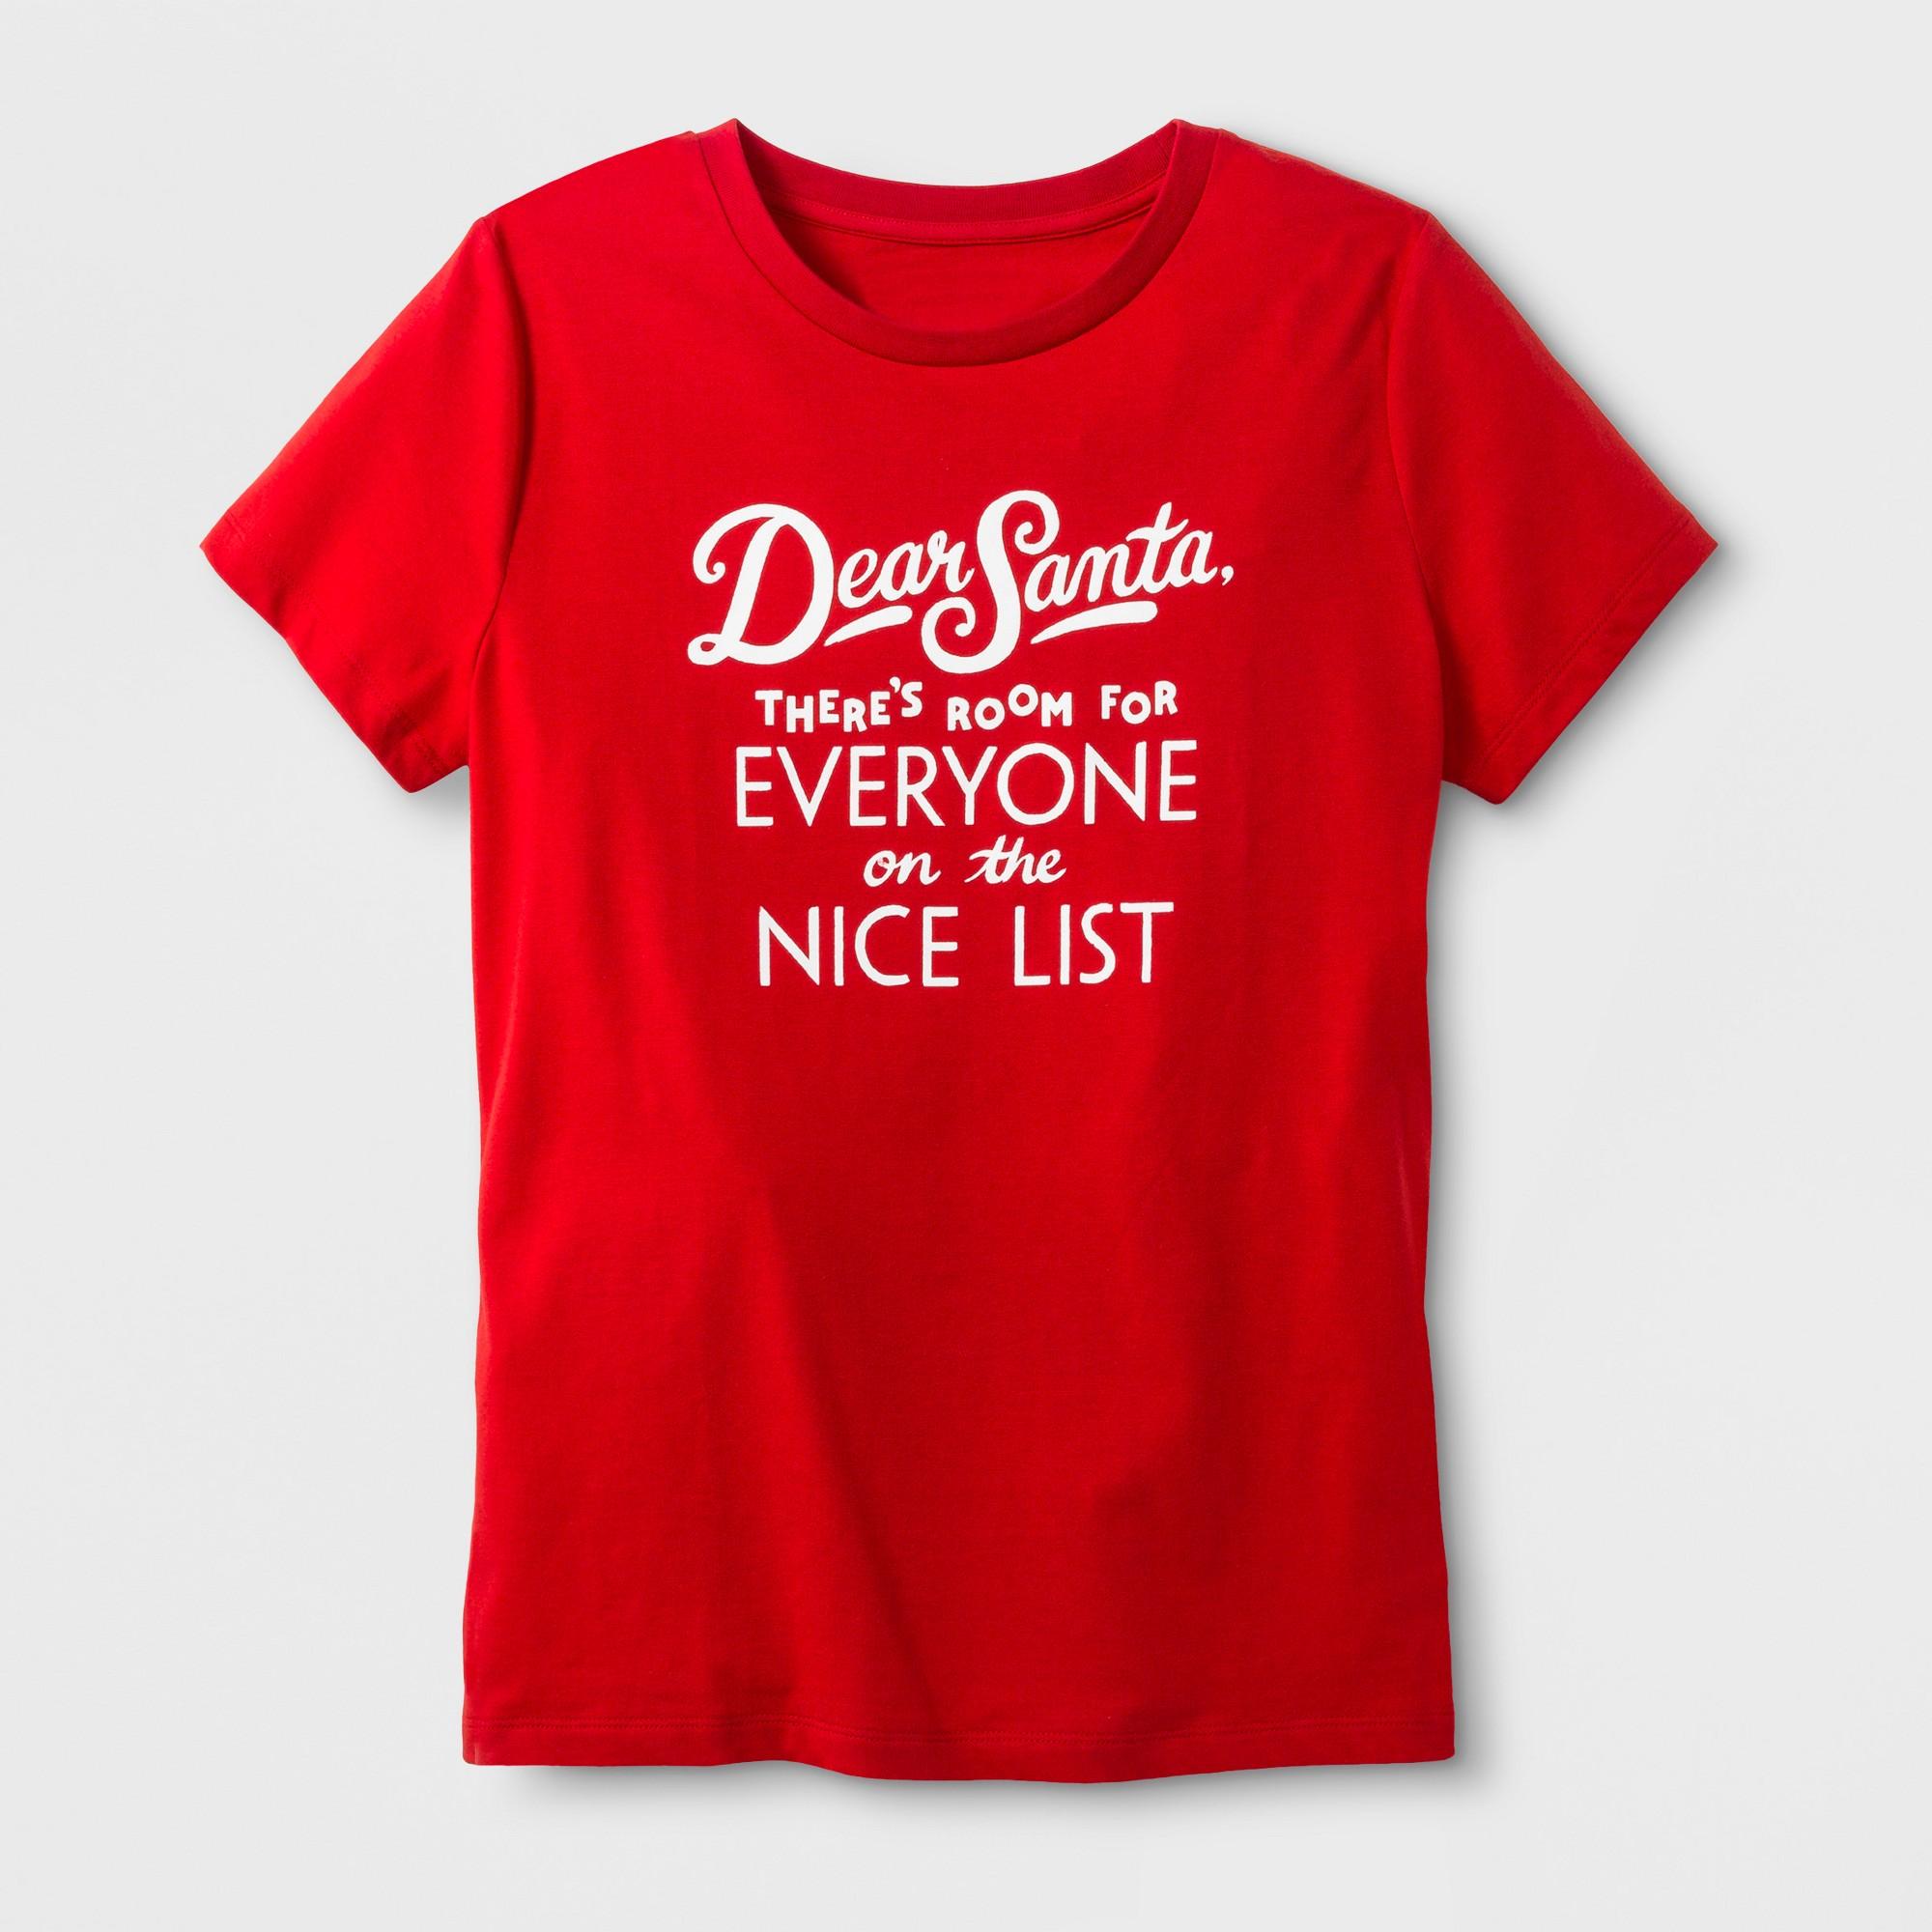 Women's Short Sleeve 'Dear Santa' TShirt Red M Funny